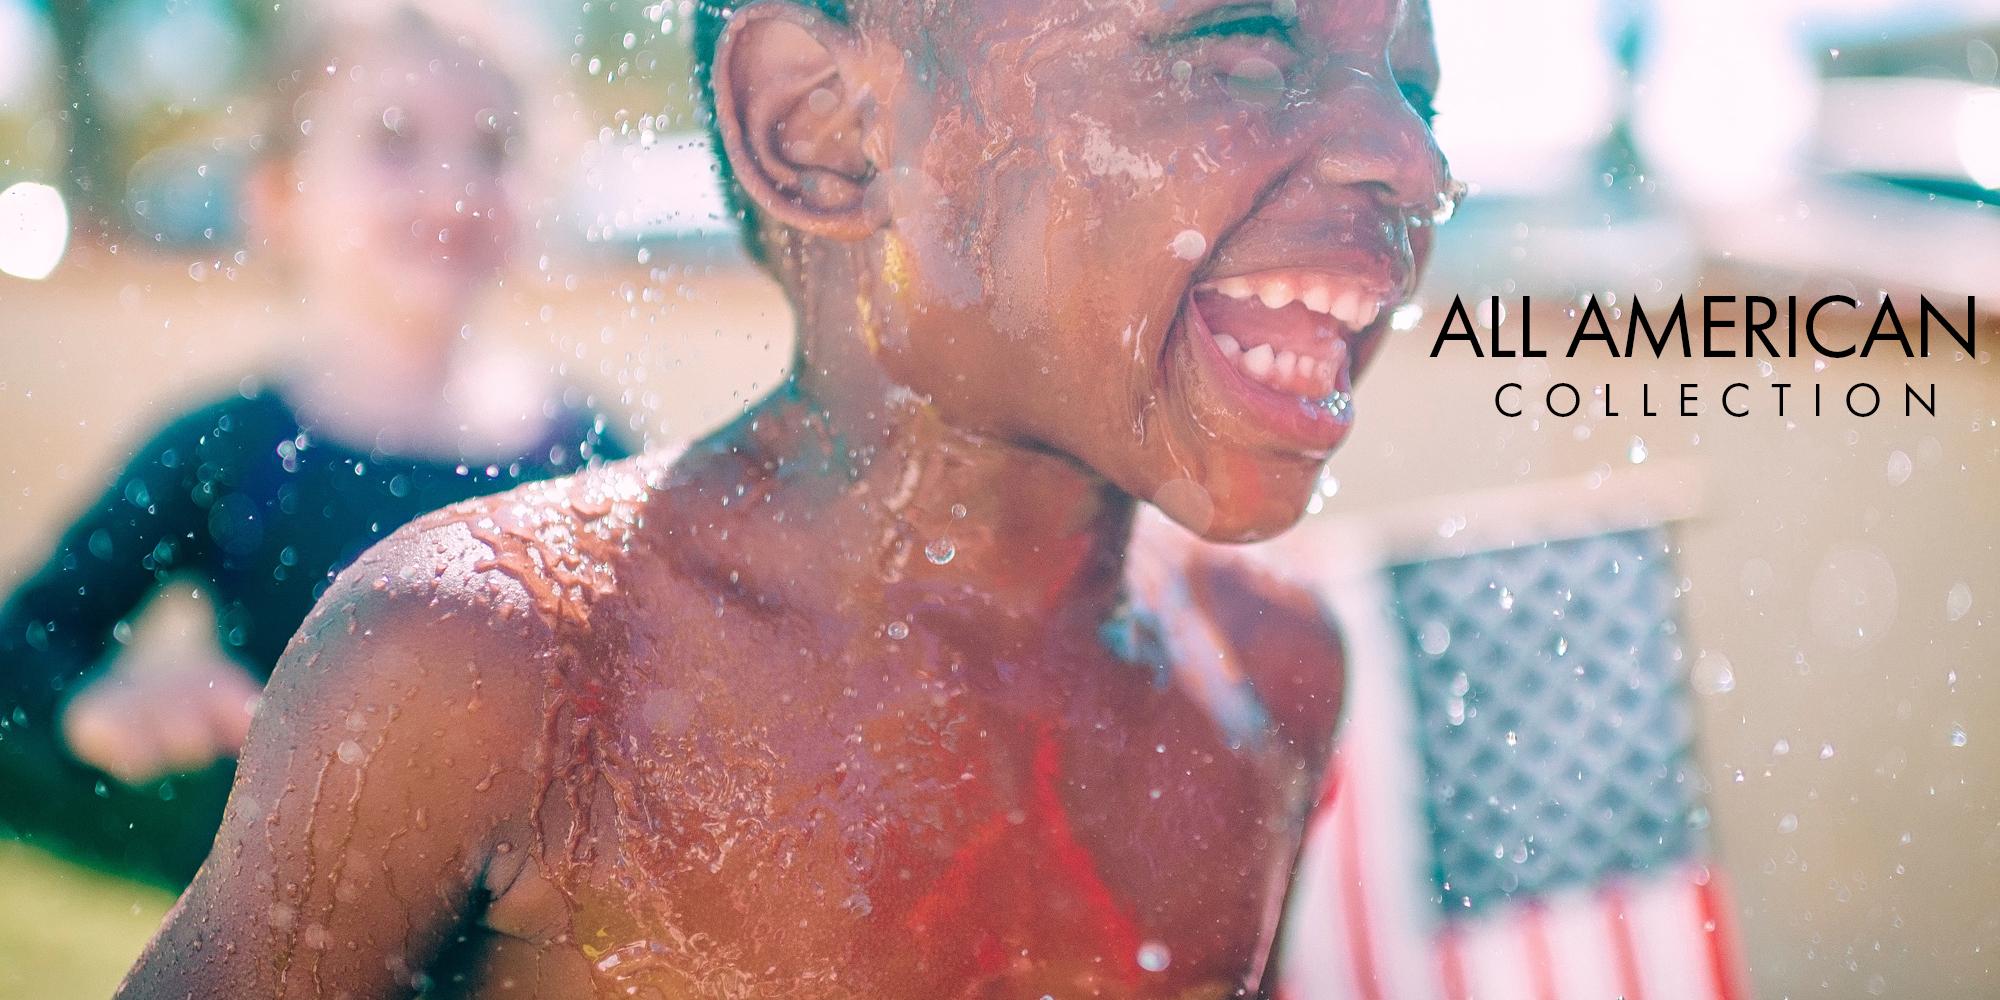 all-american-collecion-banner.jpg